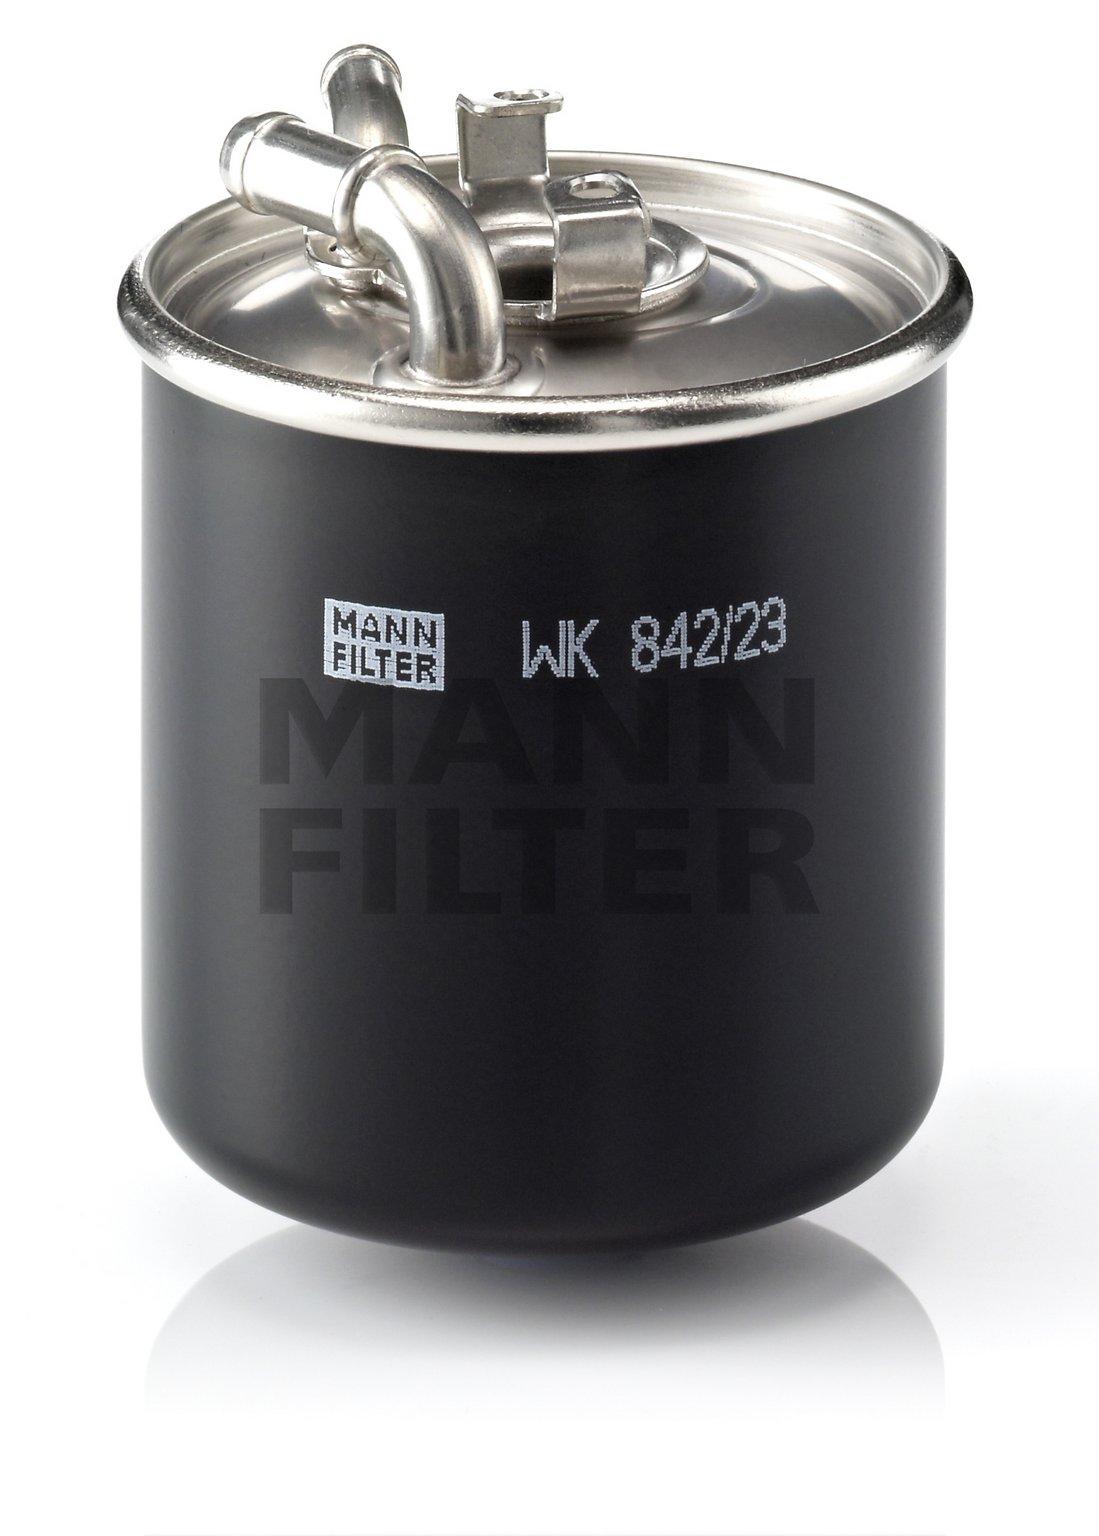 2007 Mercedes Benz Ml320 Fuel Filter 01 Location M6 Wk 842 23 X